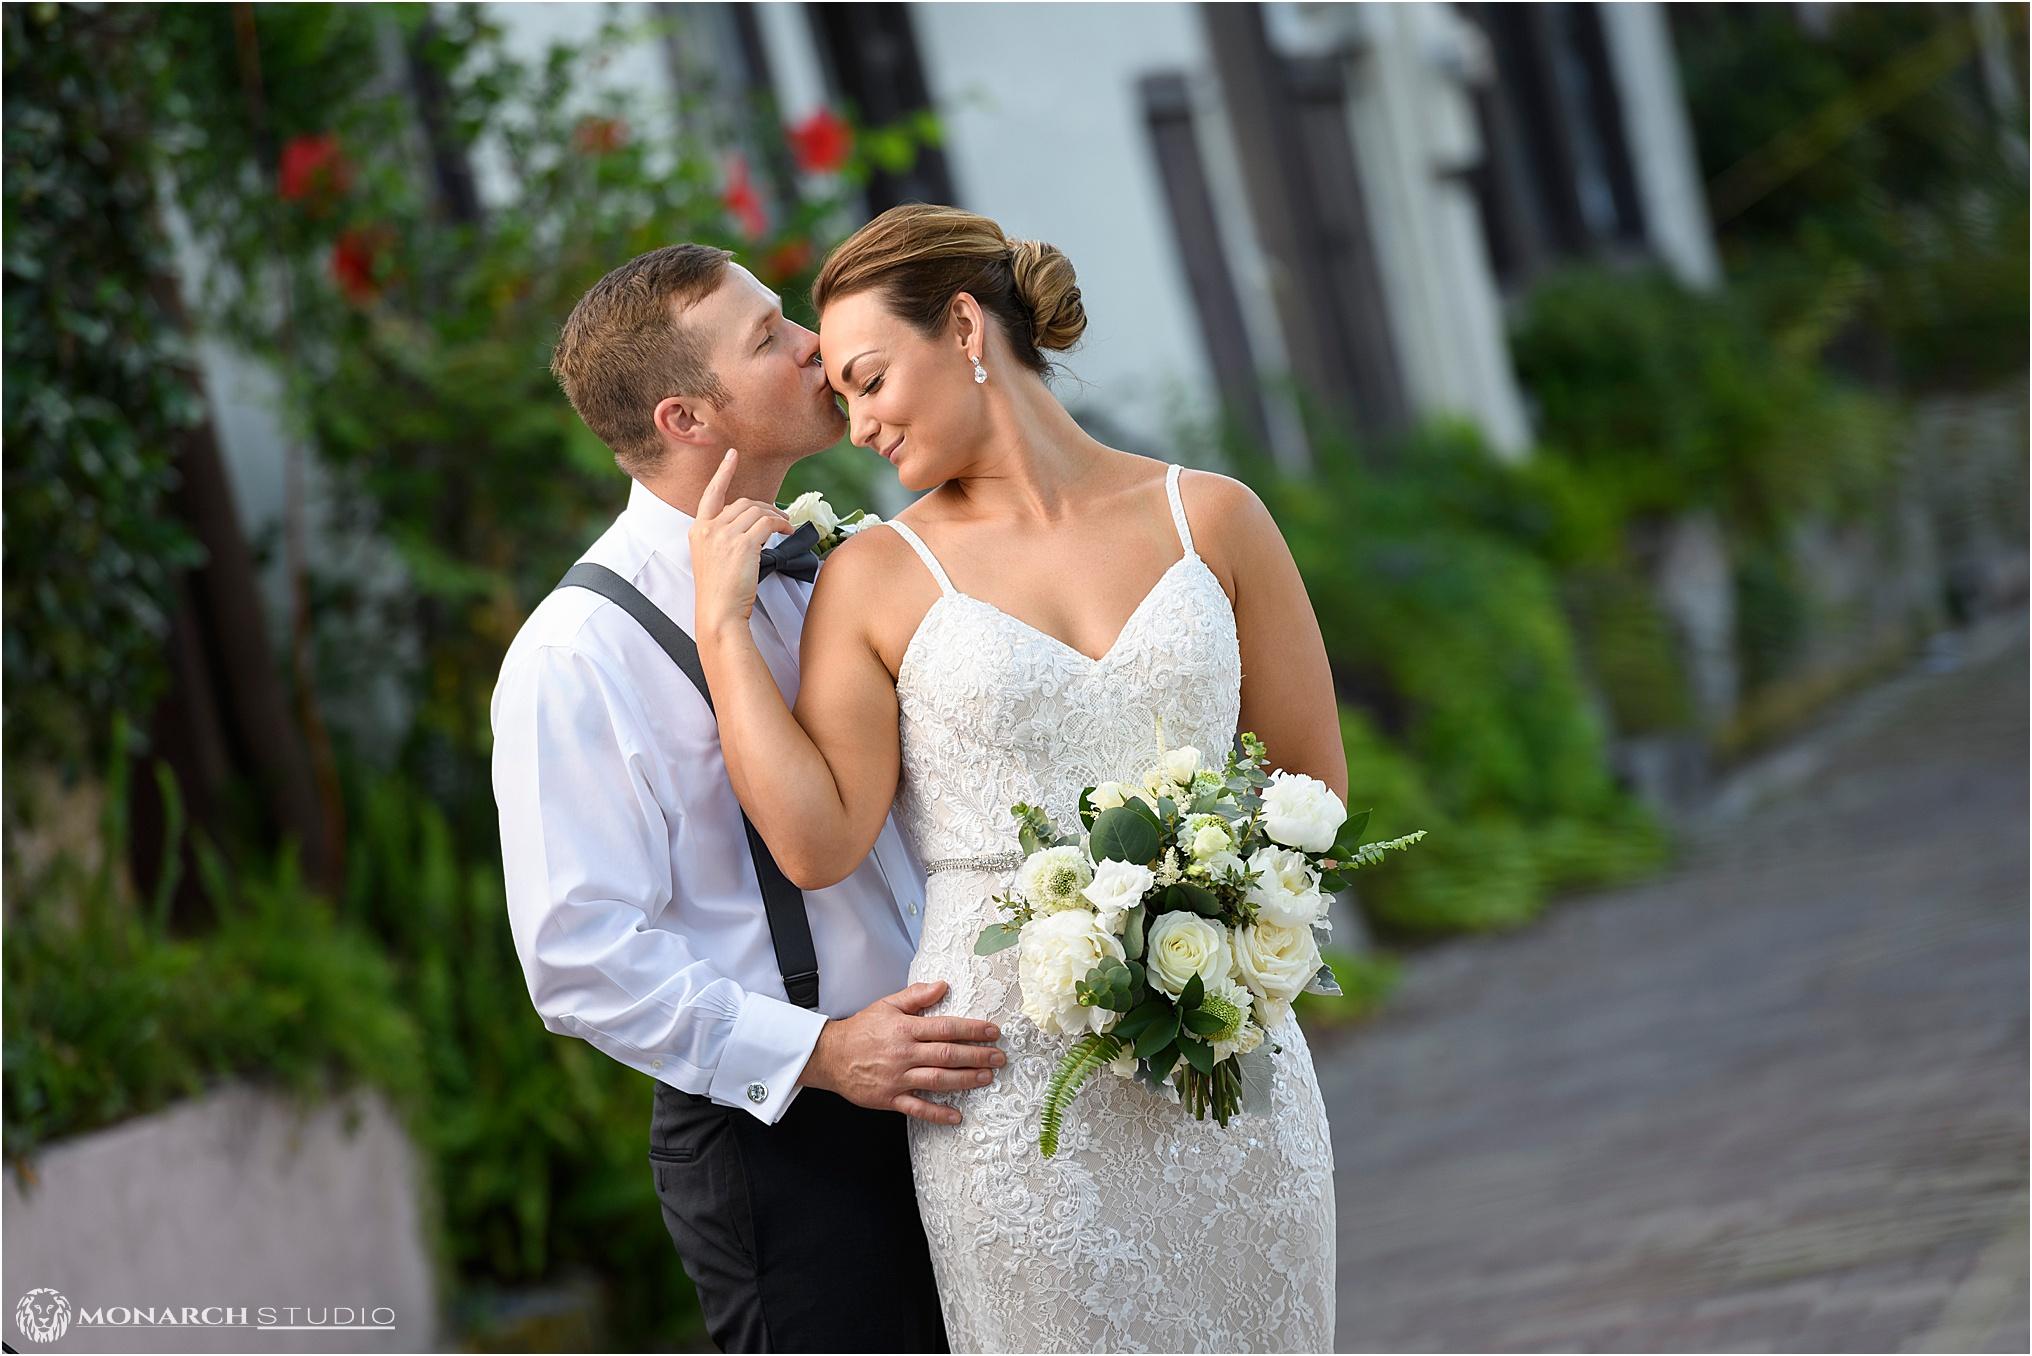 047-whiteroom-wedding-photographer-2019-05-22_0029.jpg